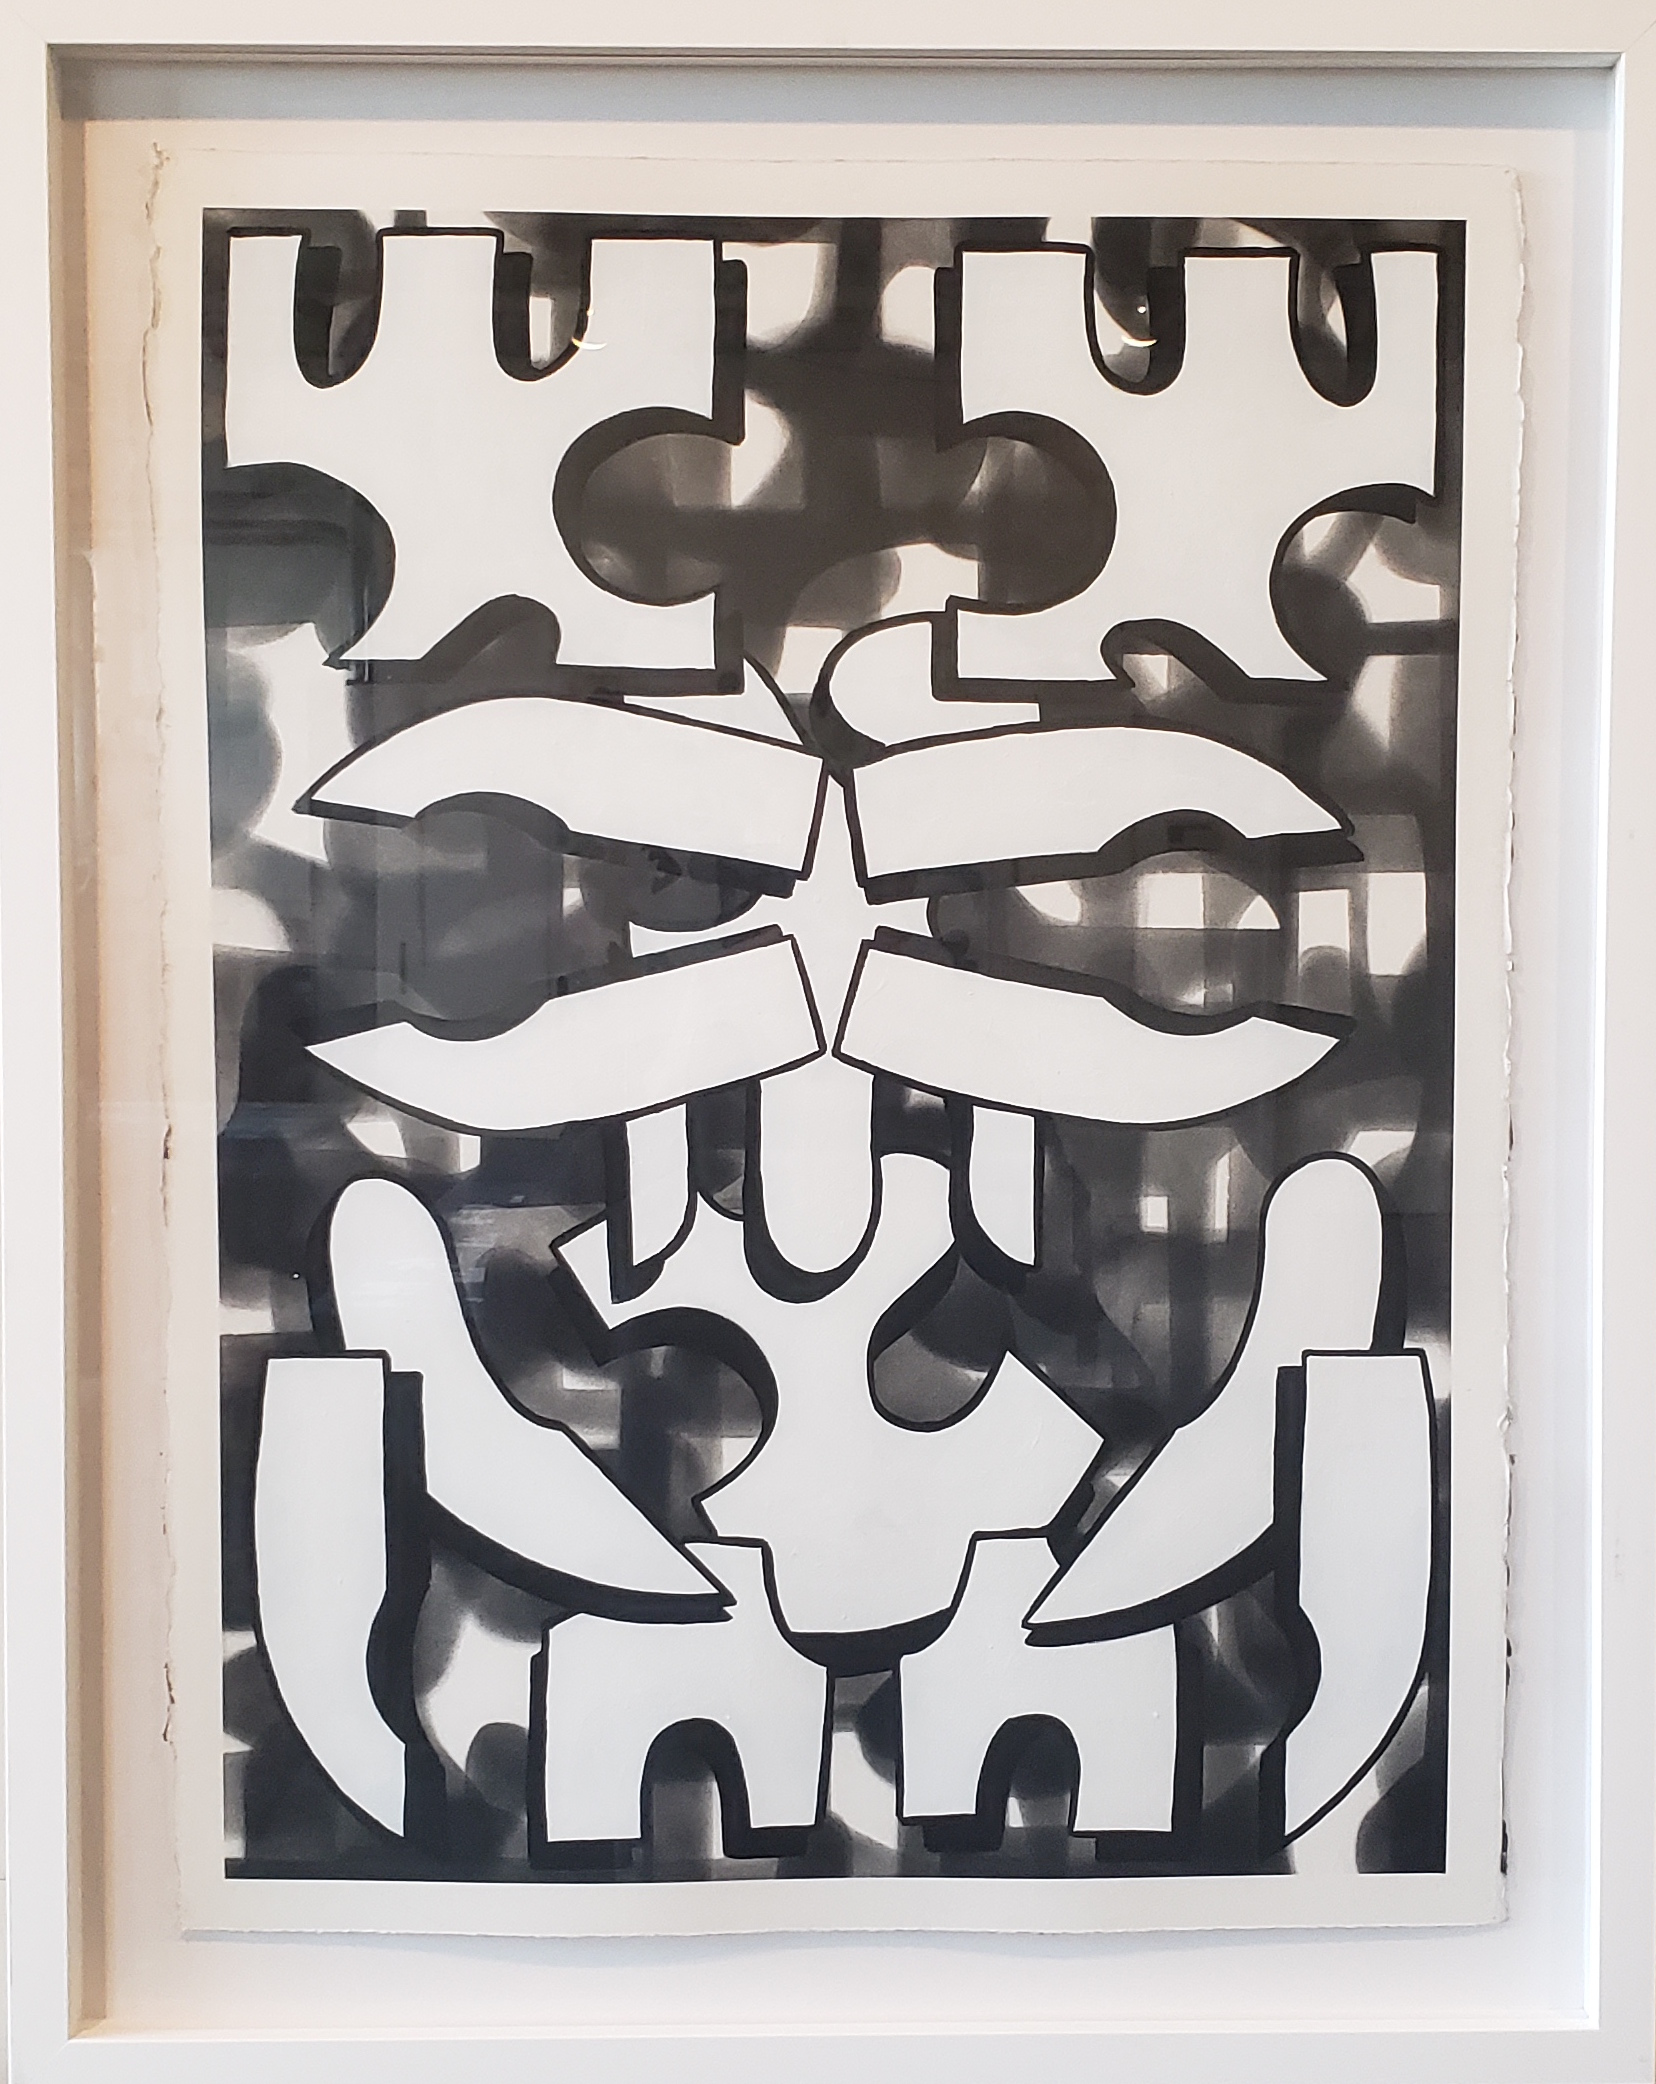 Cabeza 2,  2018  Acrylic on paper  30 x 22 in.